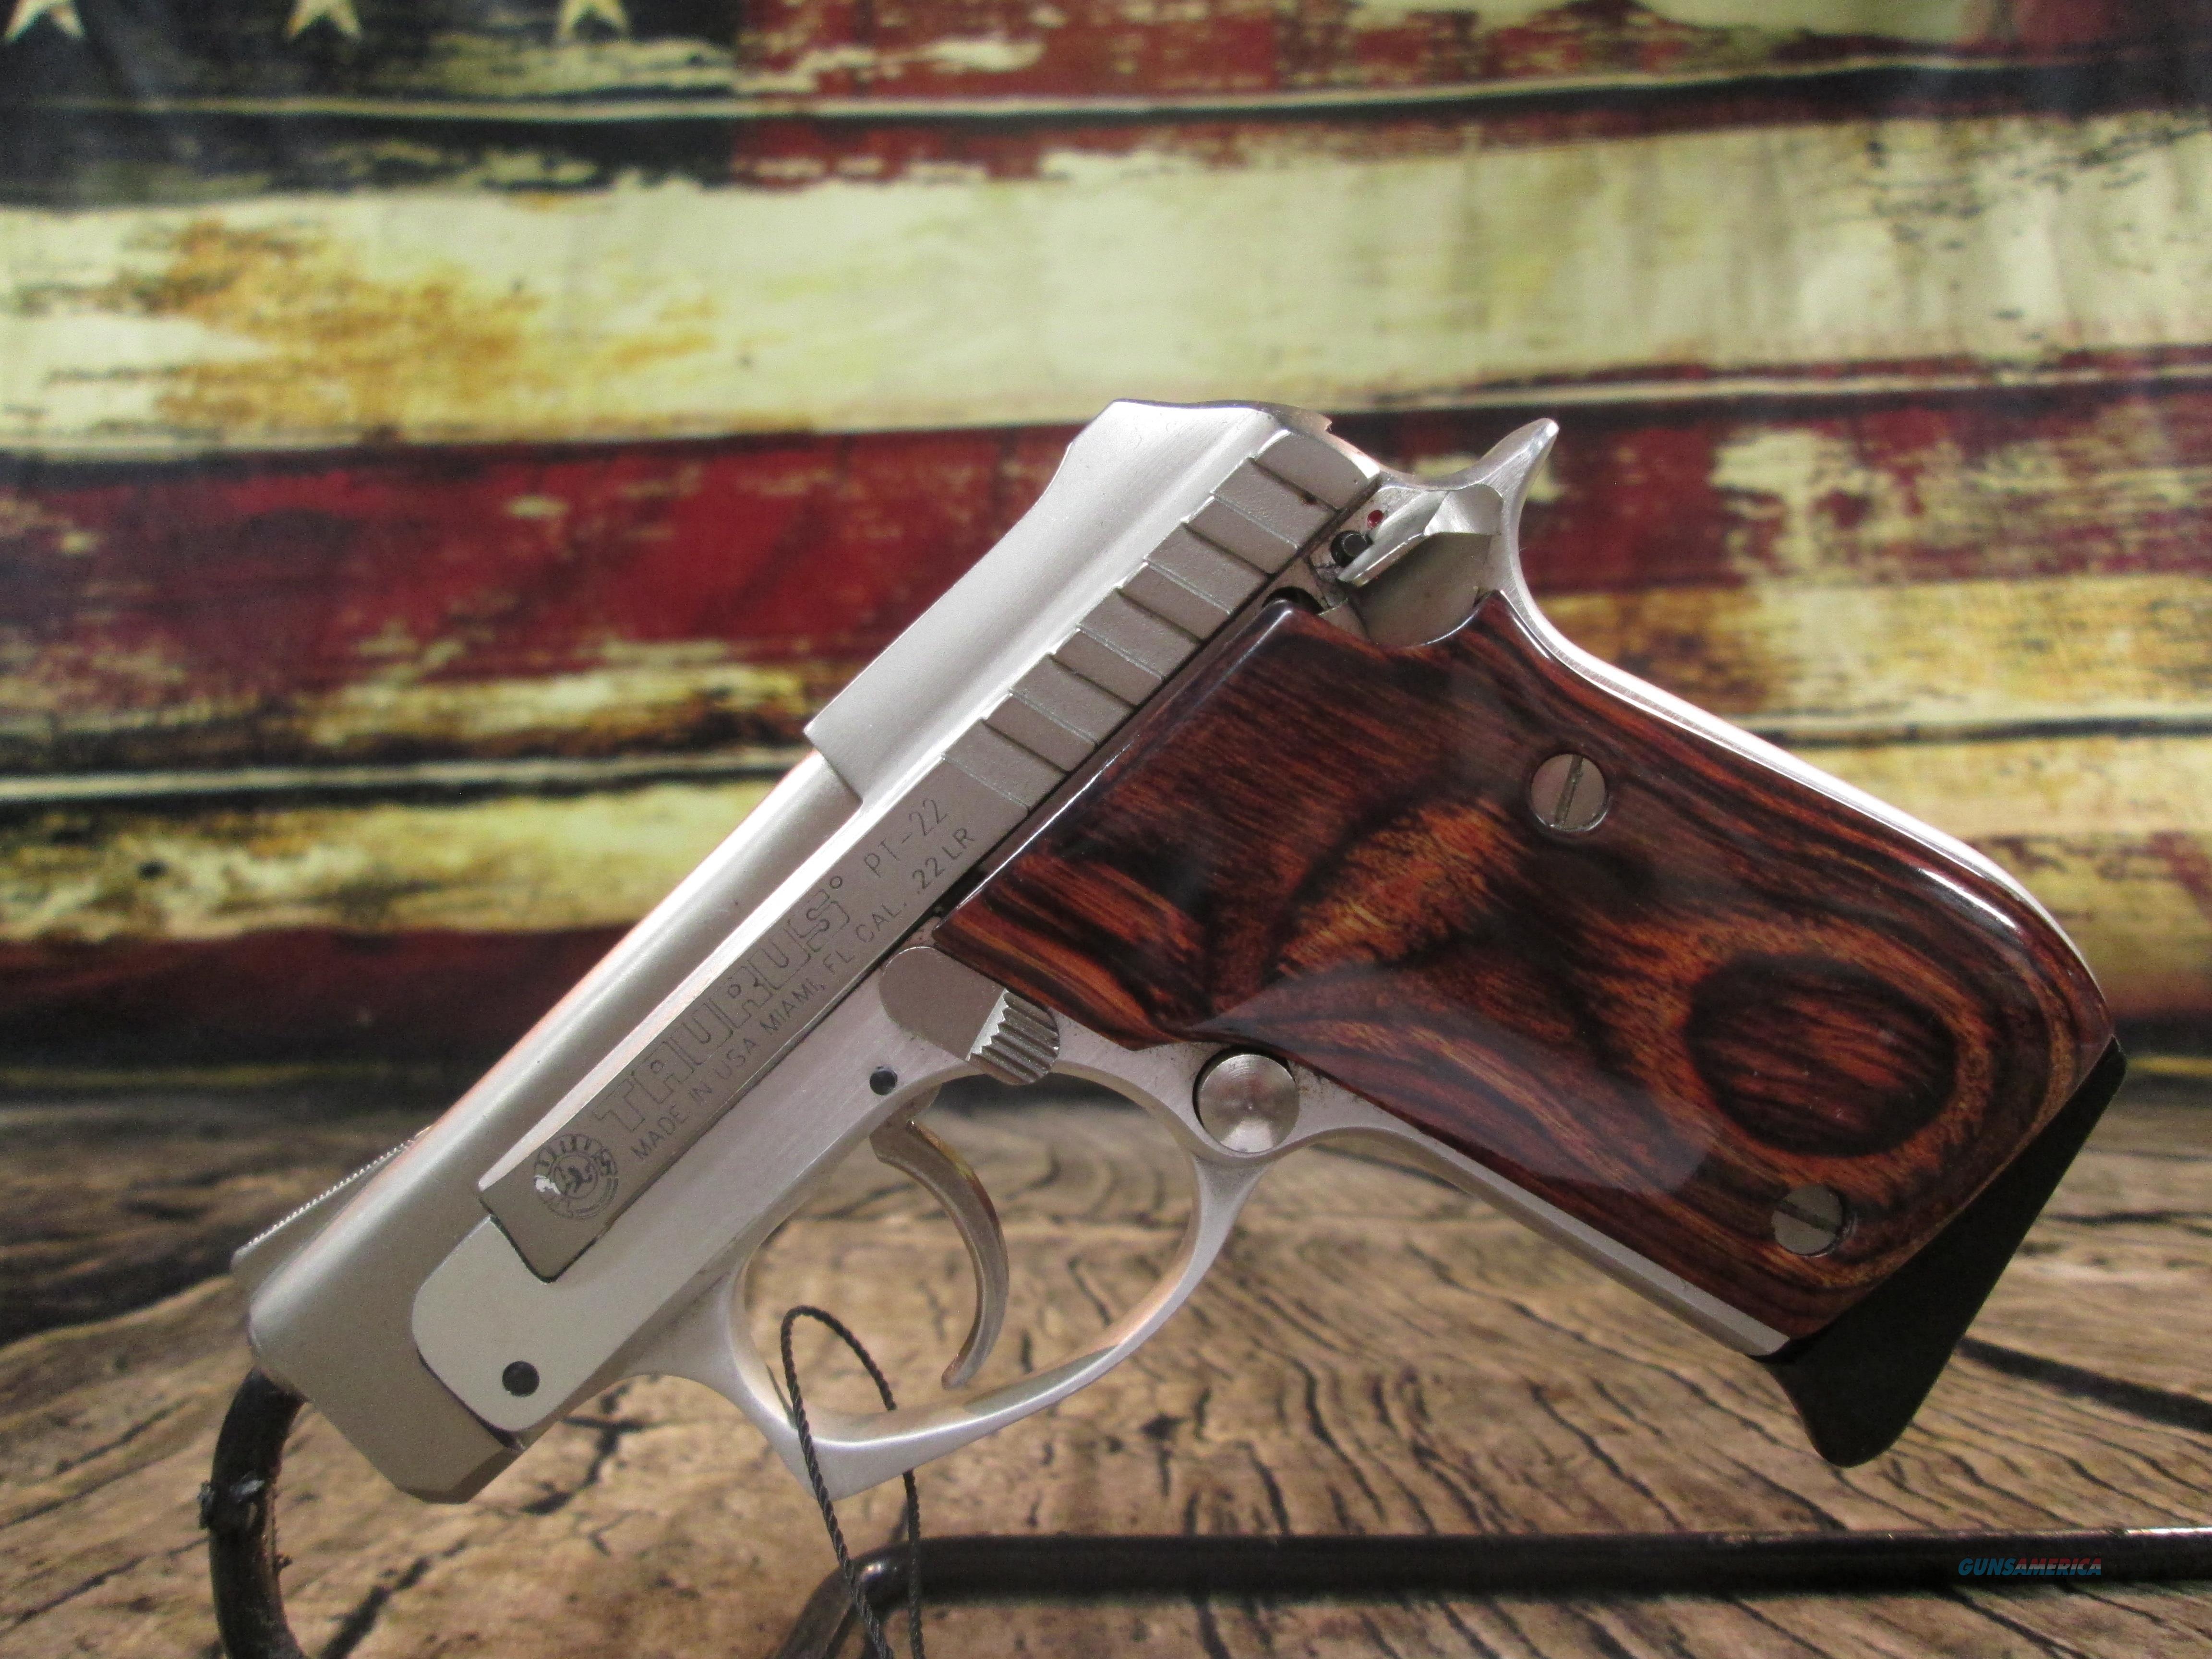 Taurus Model 22 W/ Rosewood Grips Used (61572)  Guns > Pistols > Taurus Pistols > Semi Auto Pistols > Steel Frame